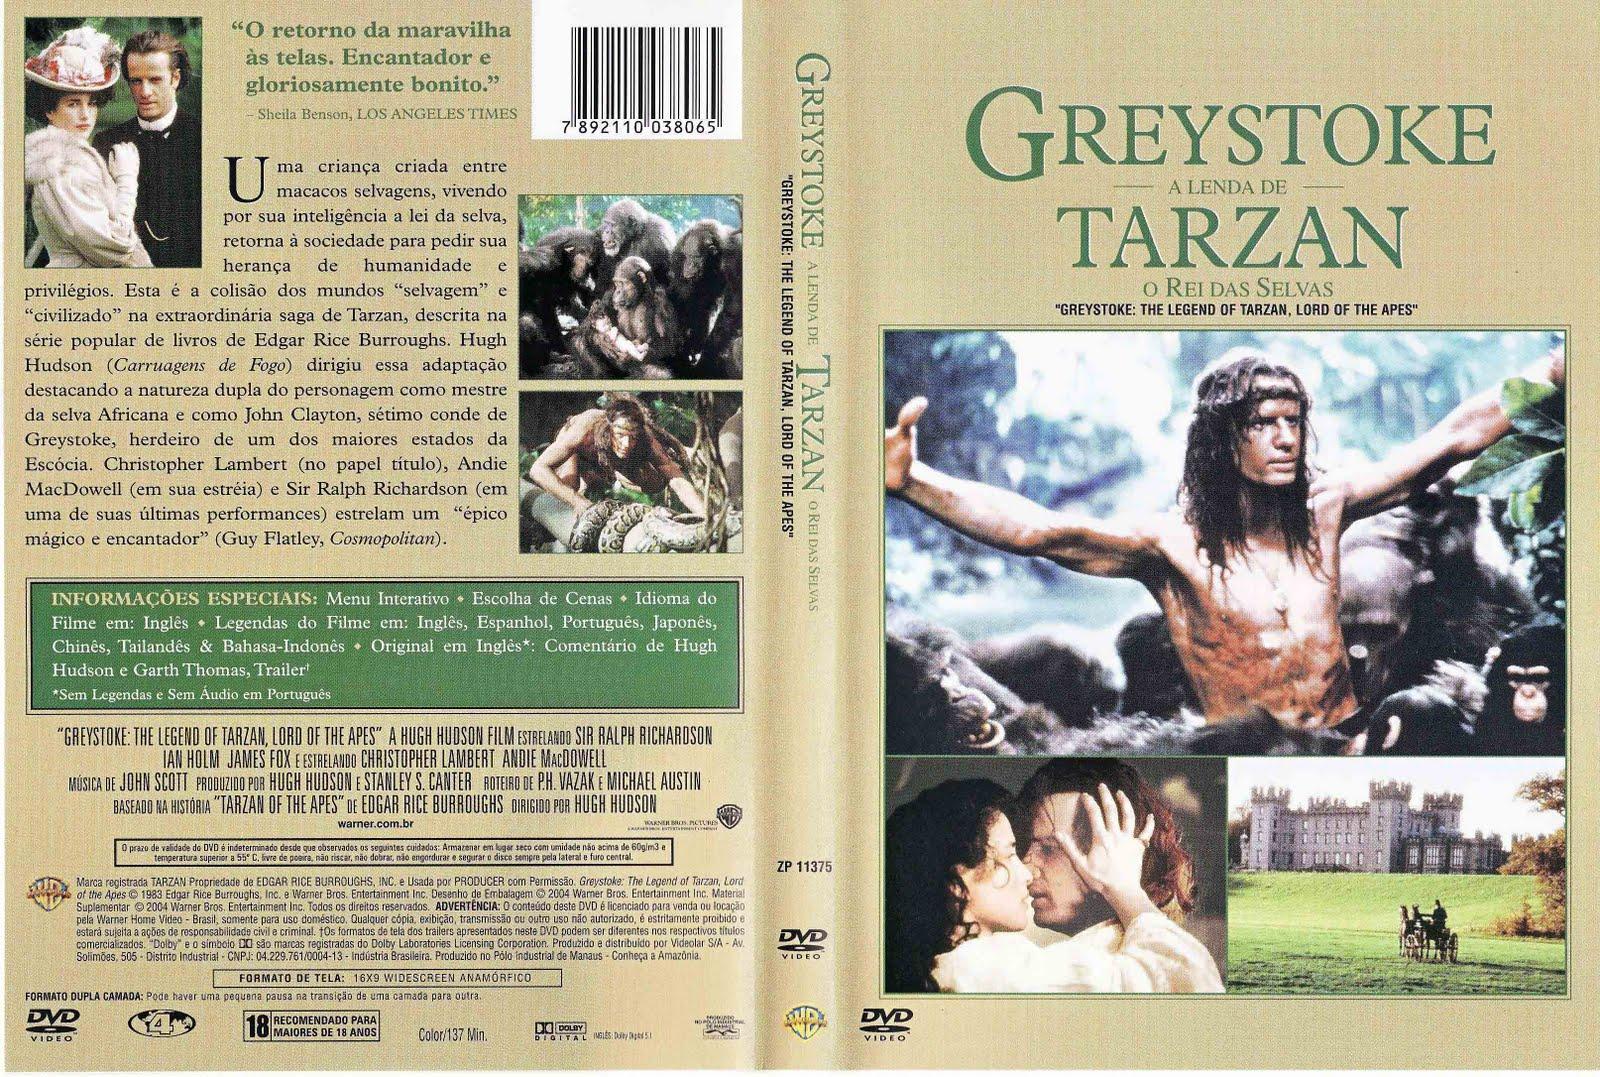 http://3.bp.blogspot.com/-Kwbm_eU0Q64/TbgO68WhzhI/AAAAAAAABOs/b7KmYCDWFiM/s1600/Greystoke_A_lenda_de_Tarzan.JPG